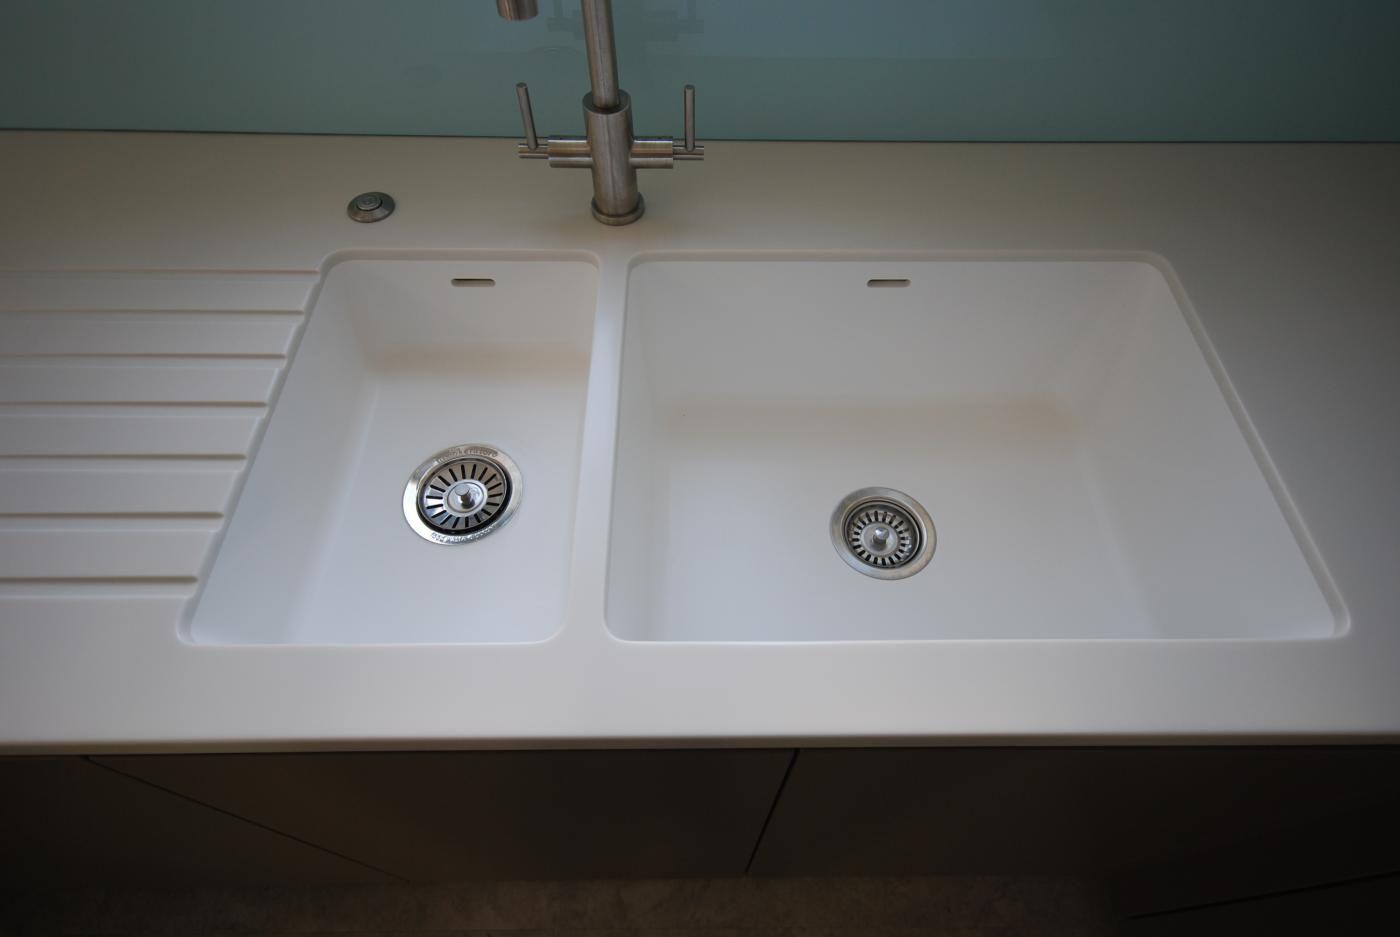 Sensational Corian 969 967 Sinks Seamlessly Joined To Worktop Download Free Architecture Designs Scobabritishbridgeorg